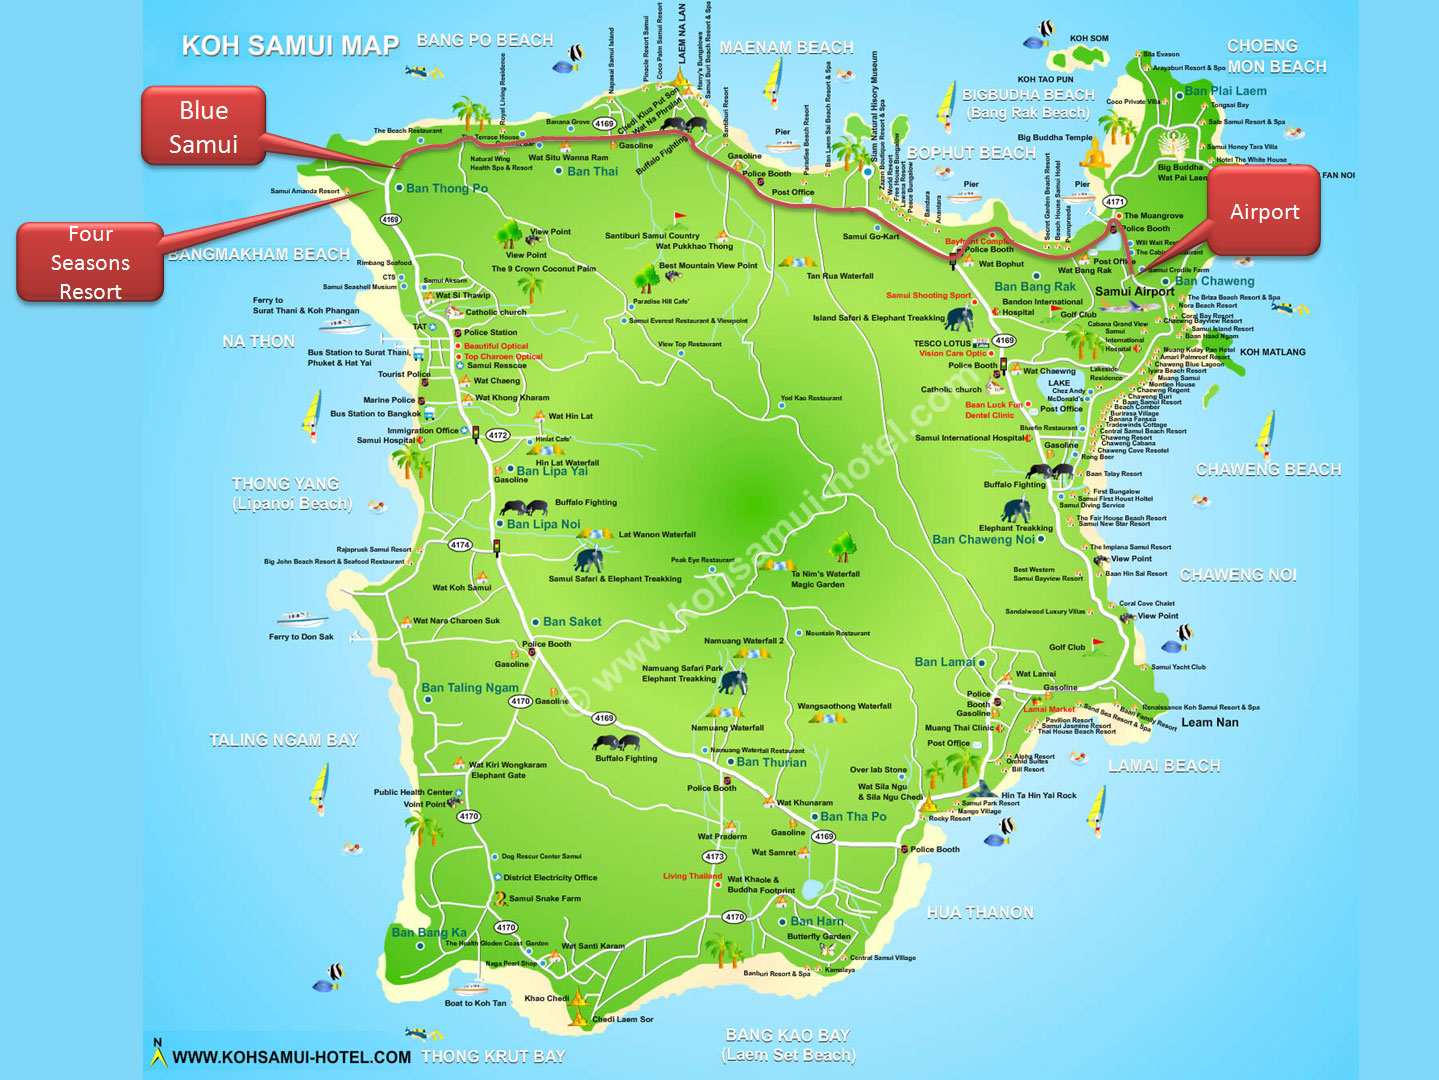 Koh Samui Airport Map Airport Samui   Blue Samui Villa Koh Samui Thailand